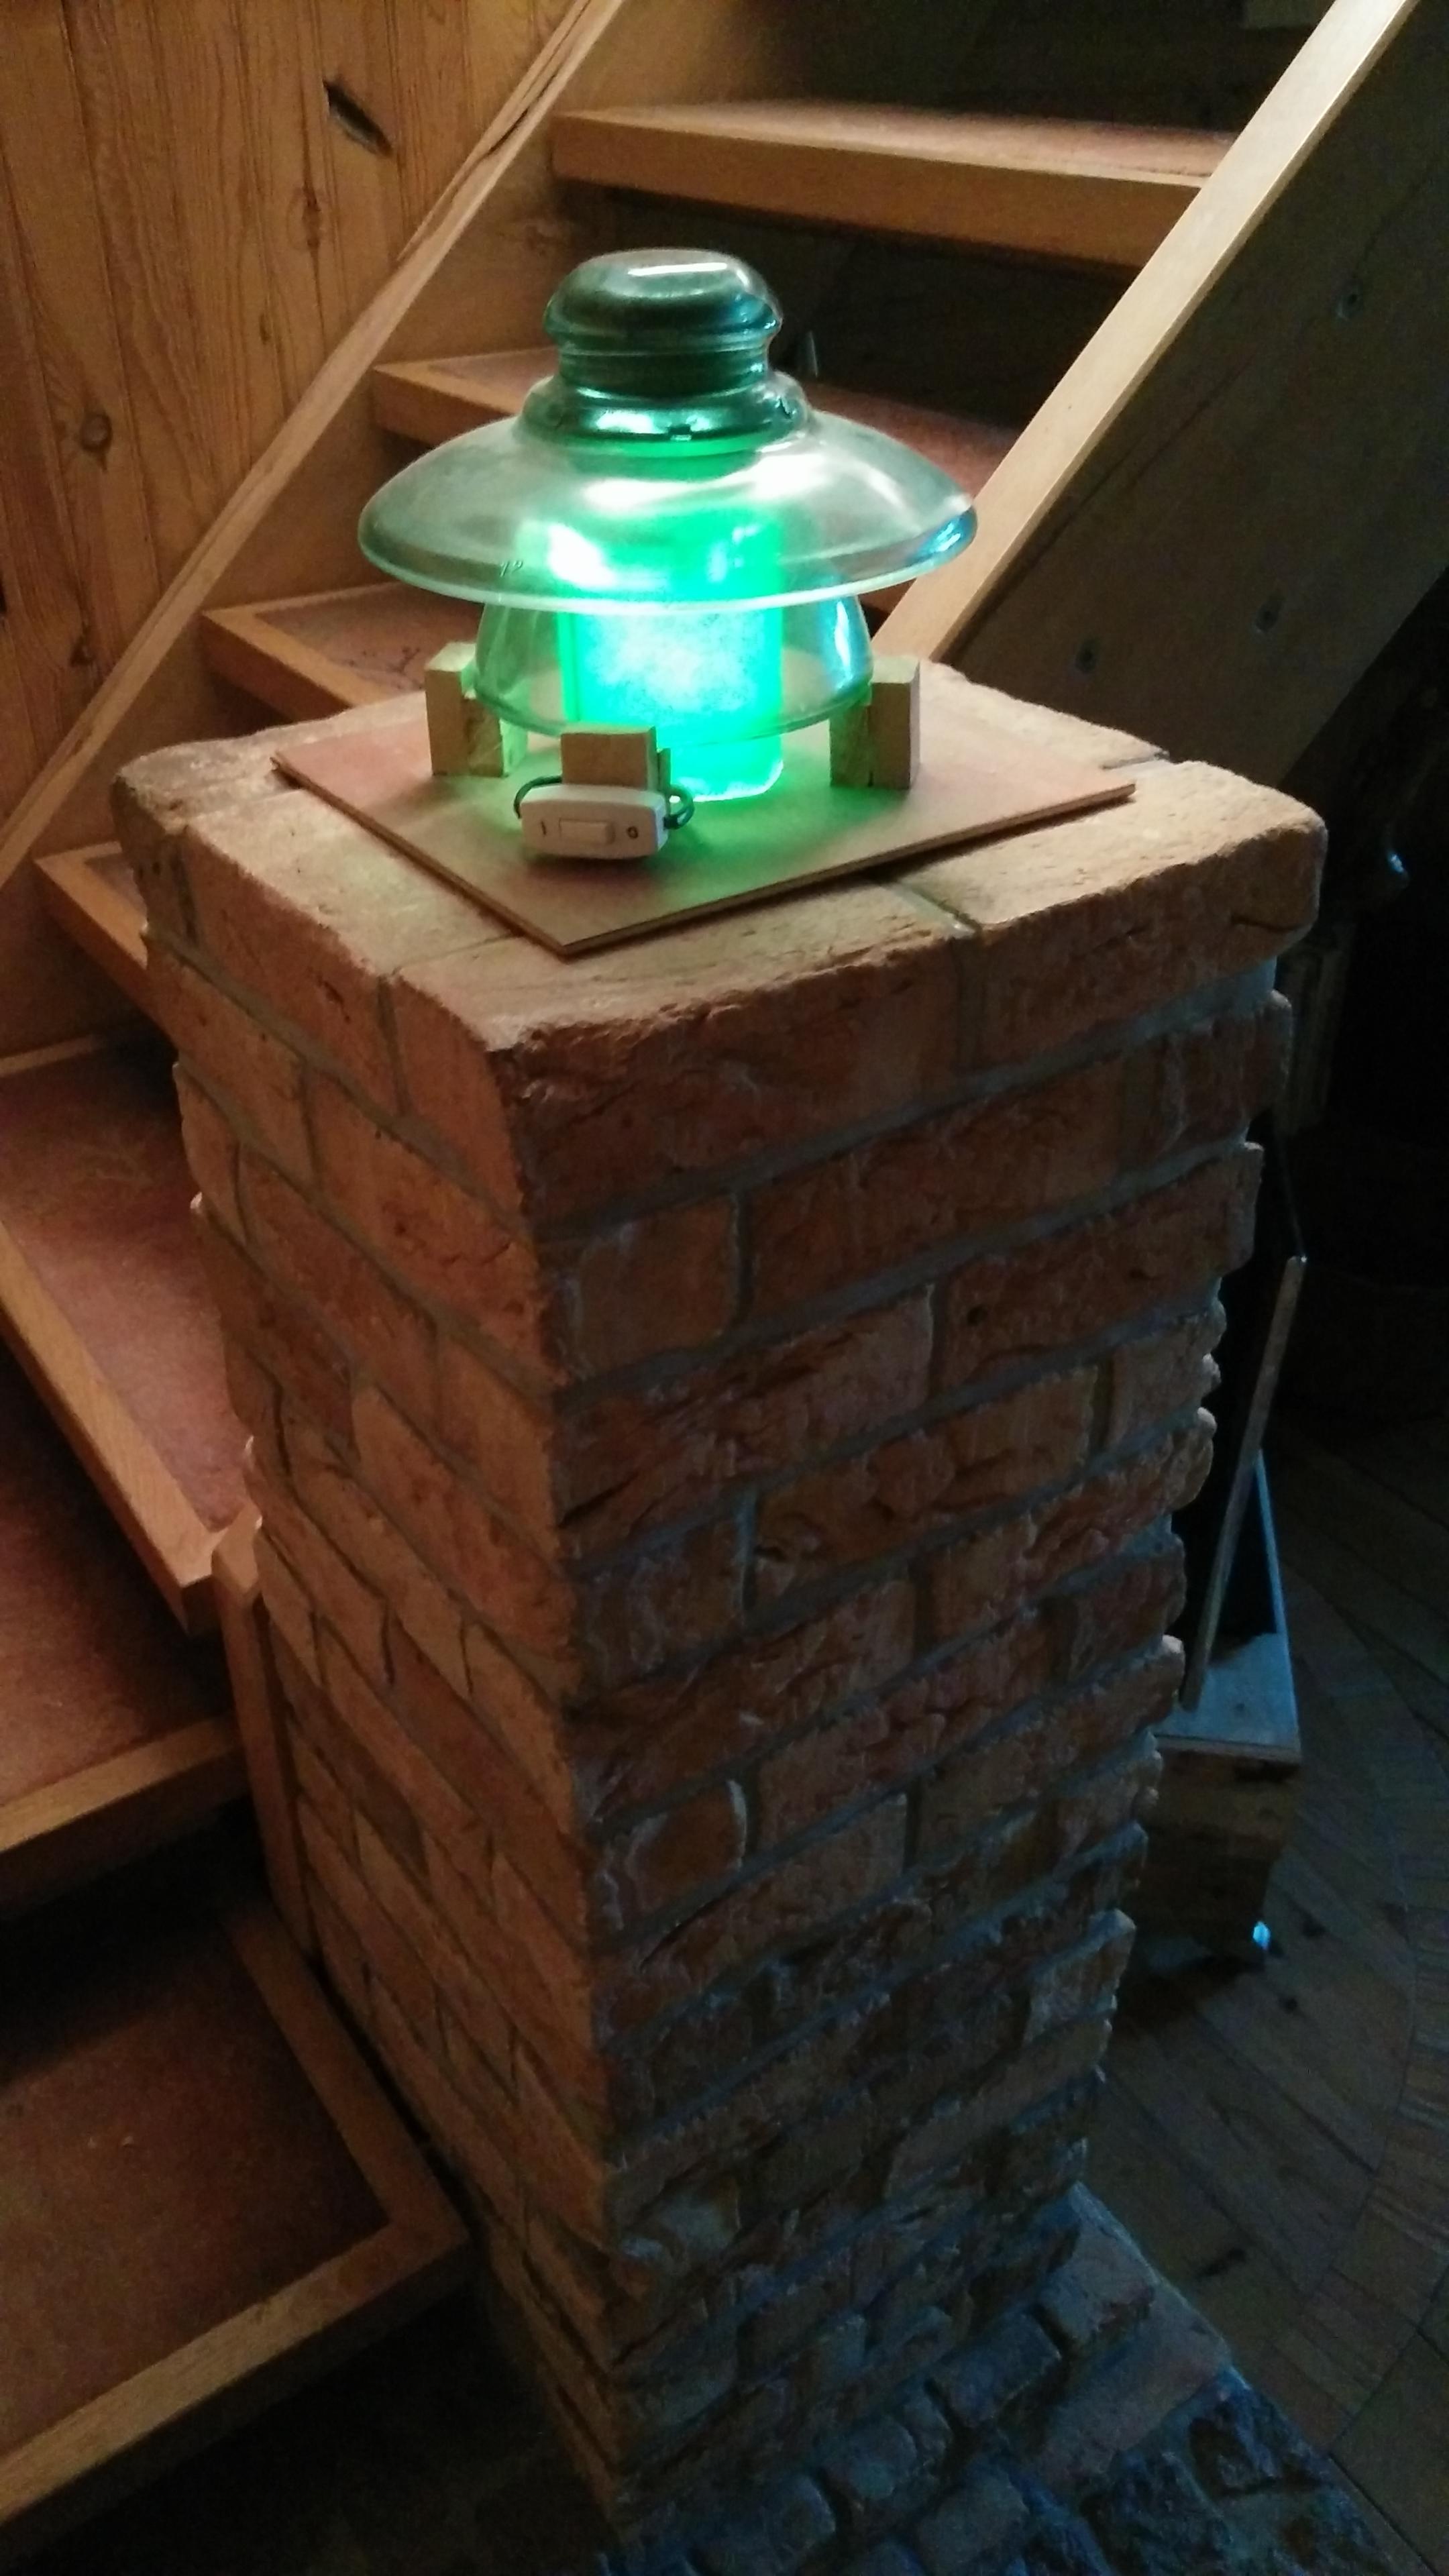 Glass Insulator Lamp